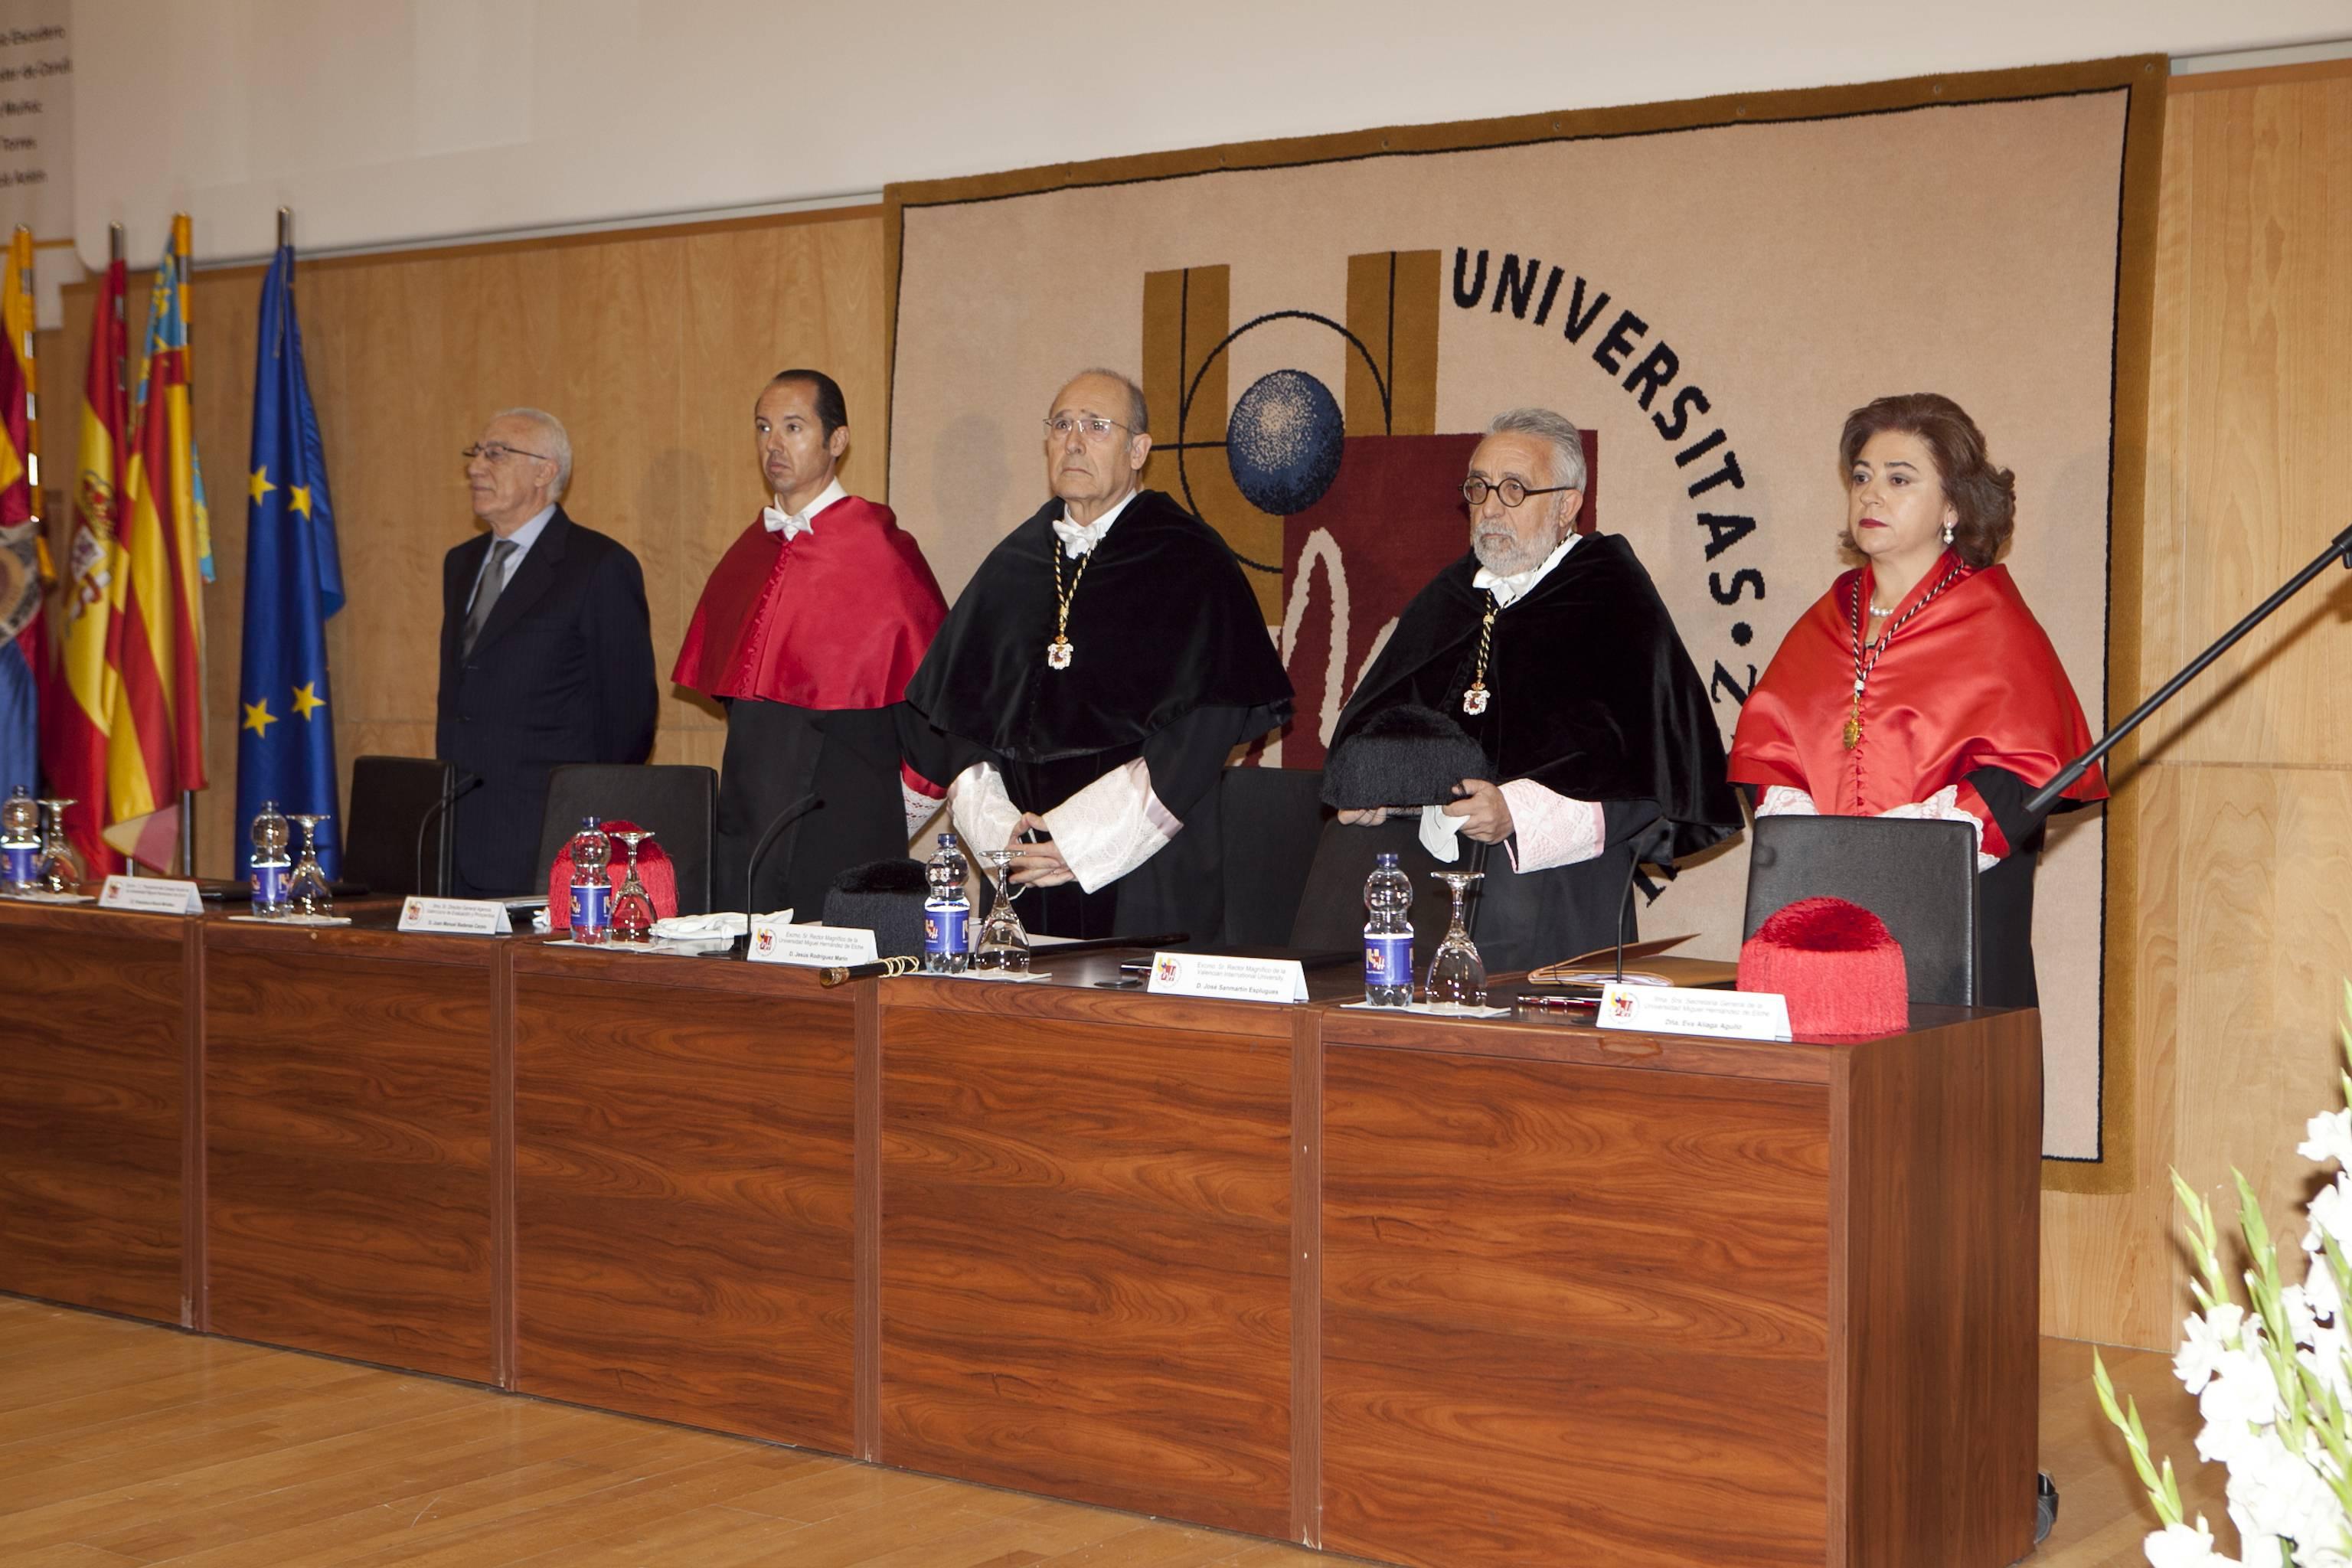 doctor-honoris-causa-luis-gamir_mg_0645.jpg